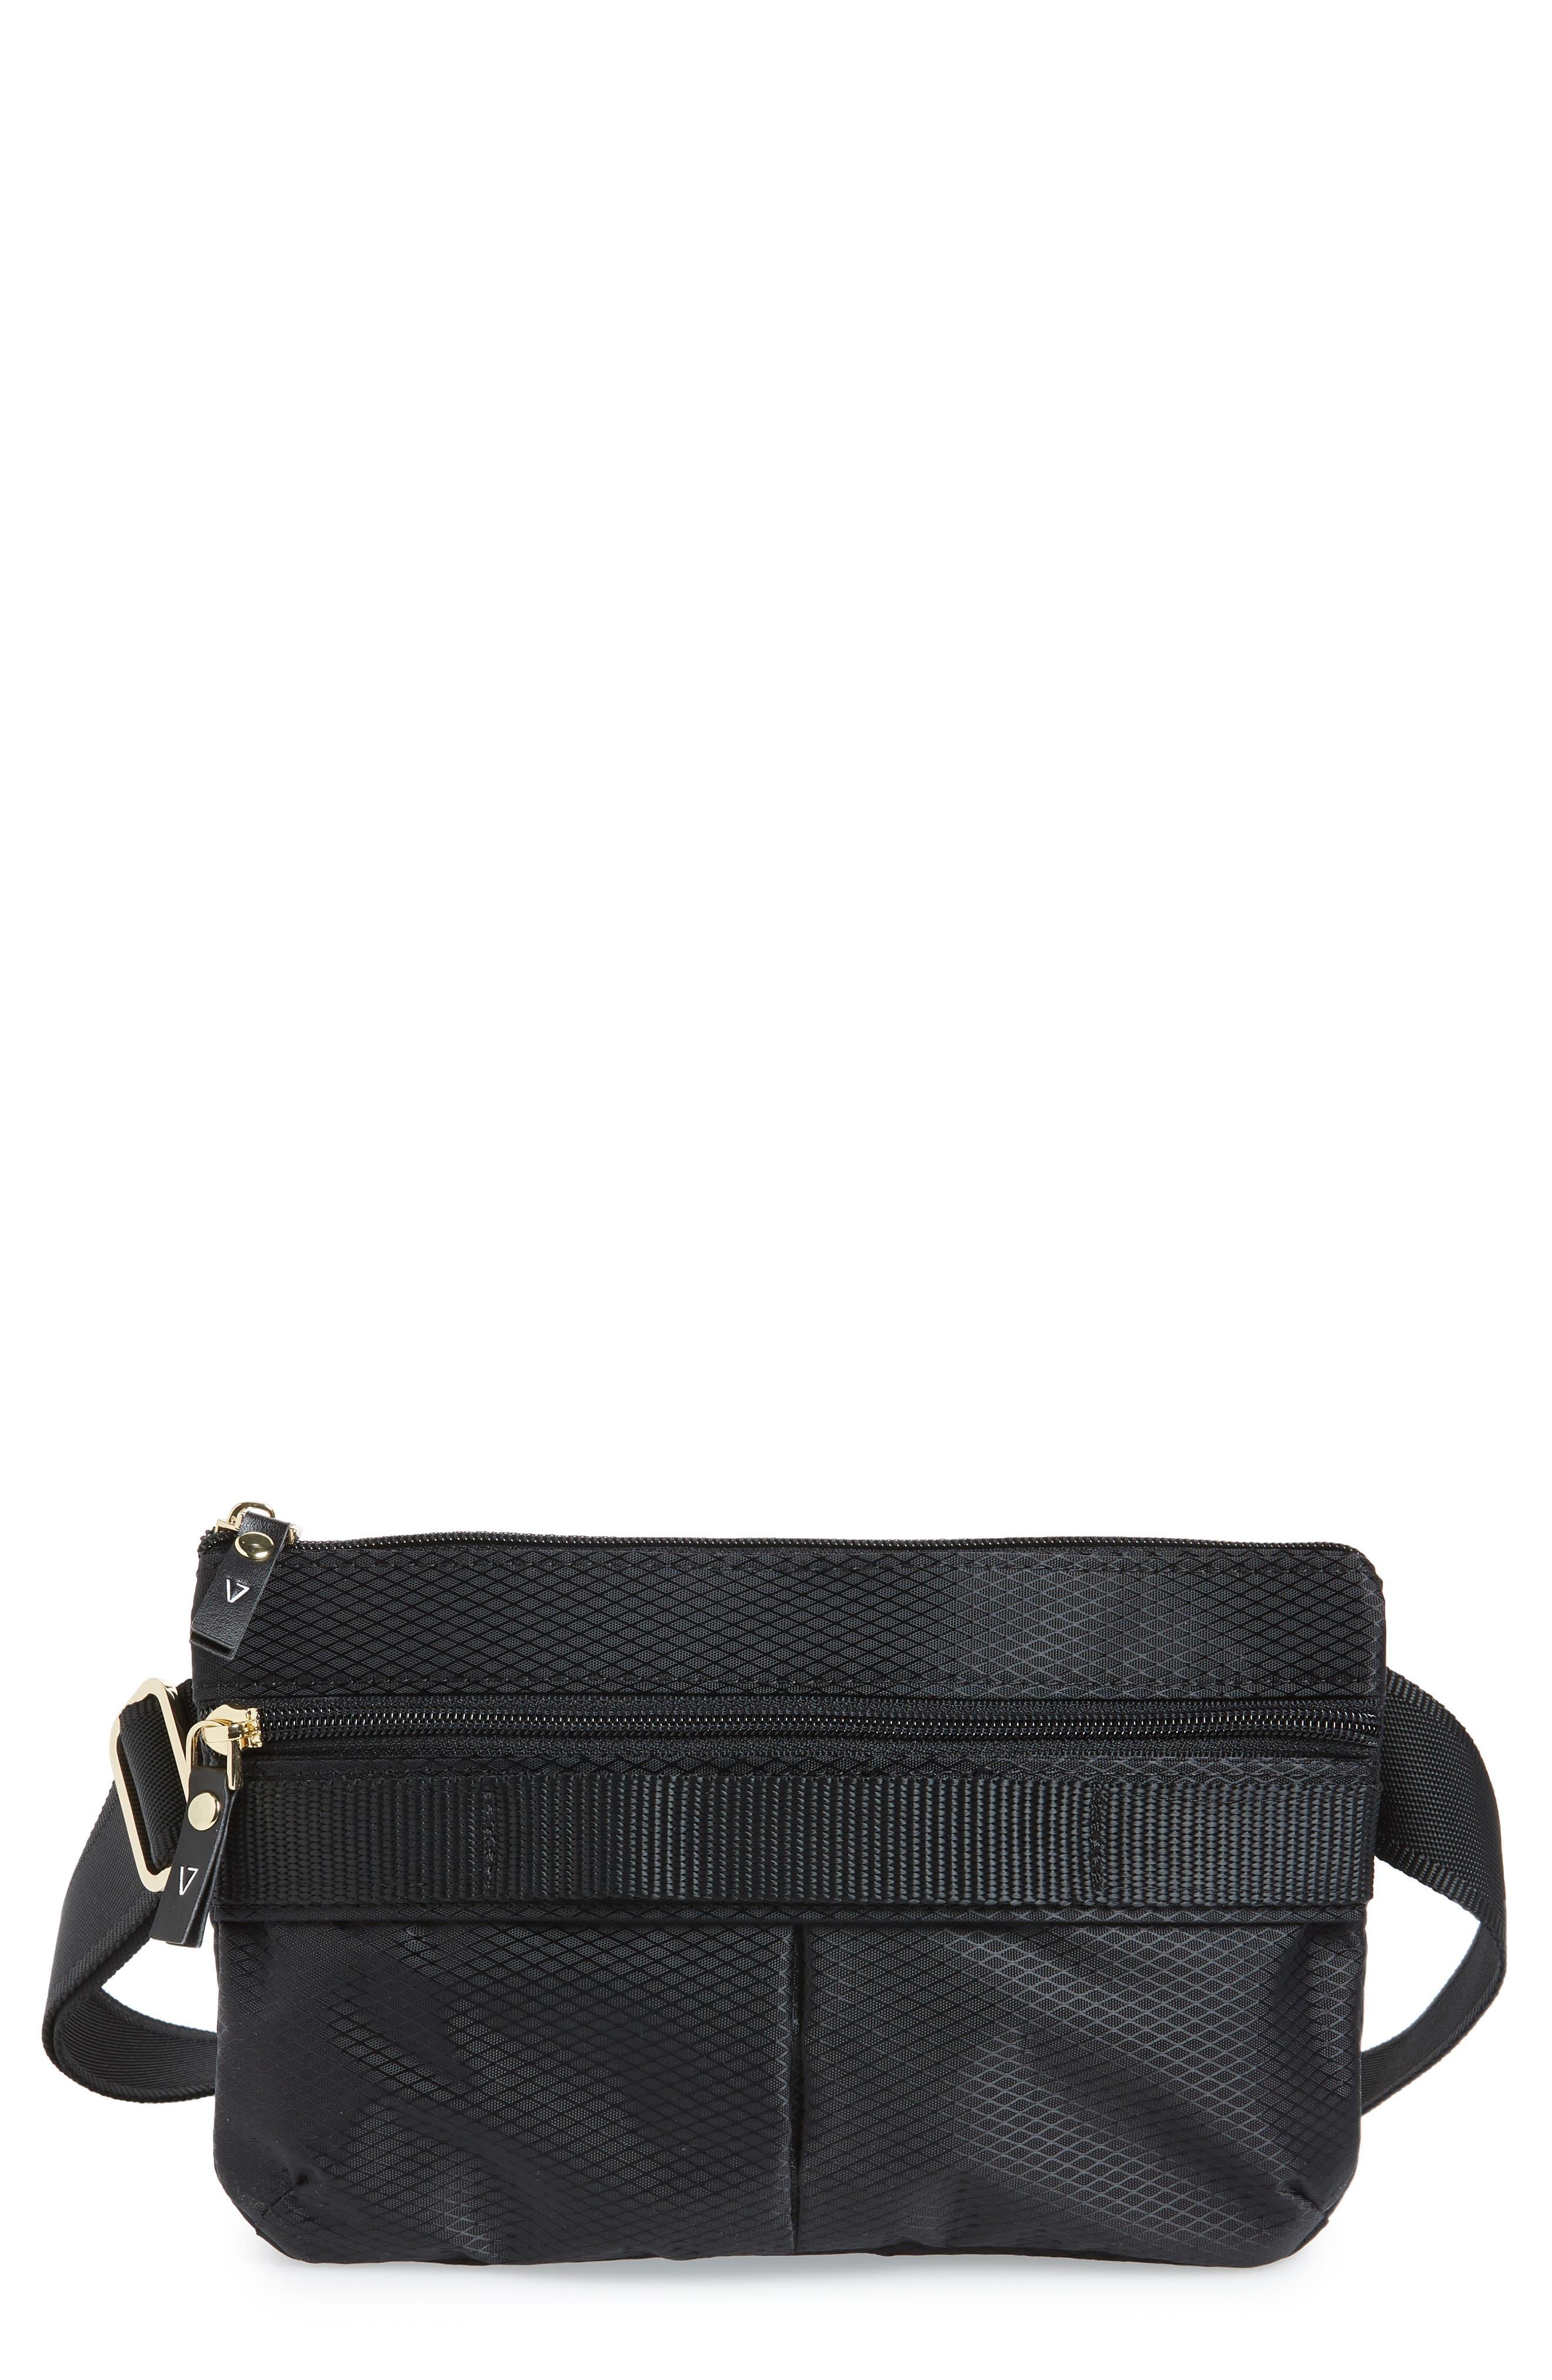 Go Black Expandable Belt Bag,                             Main thumbnail 1, color,                             BLACK